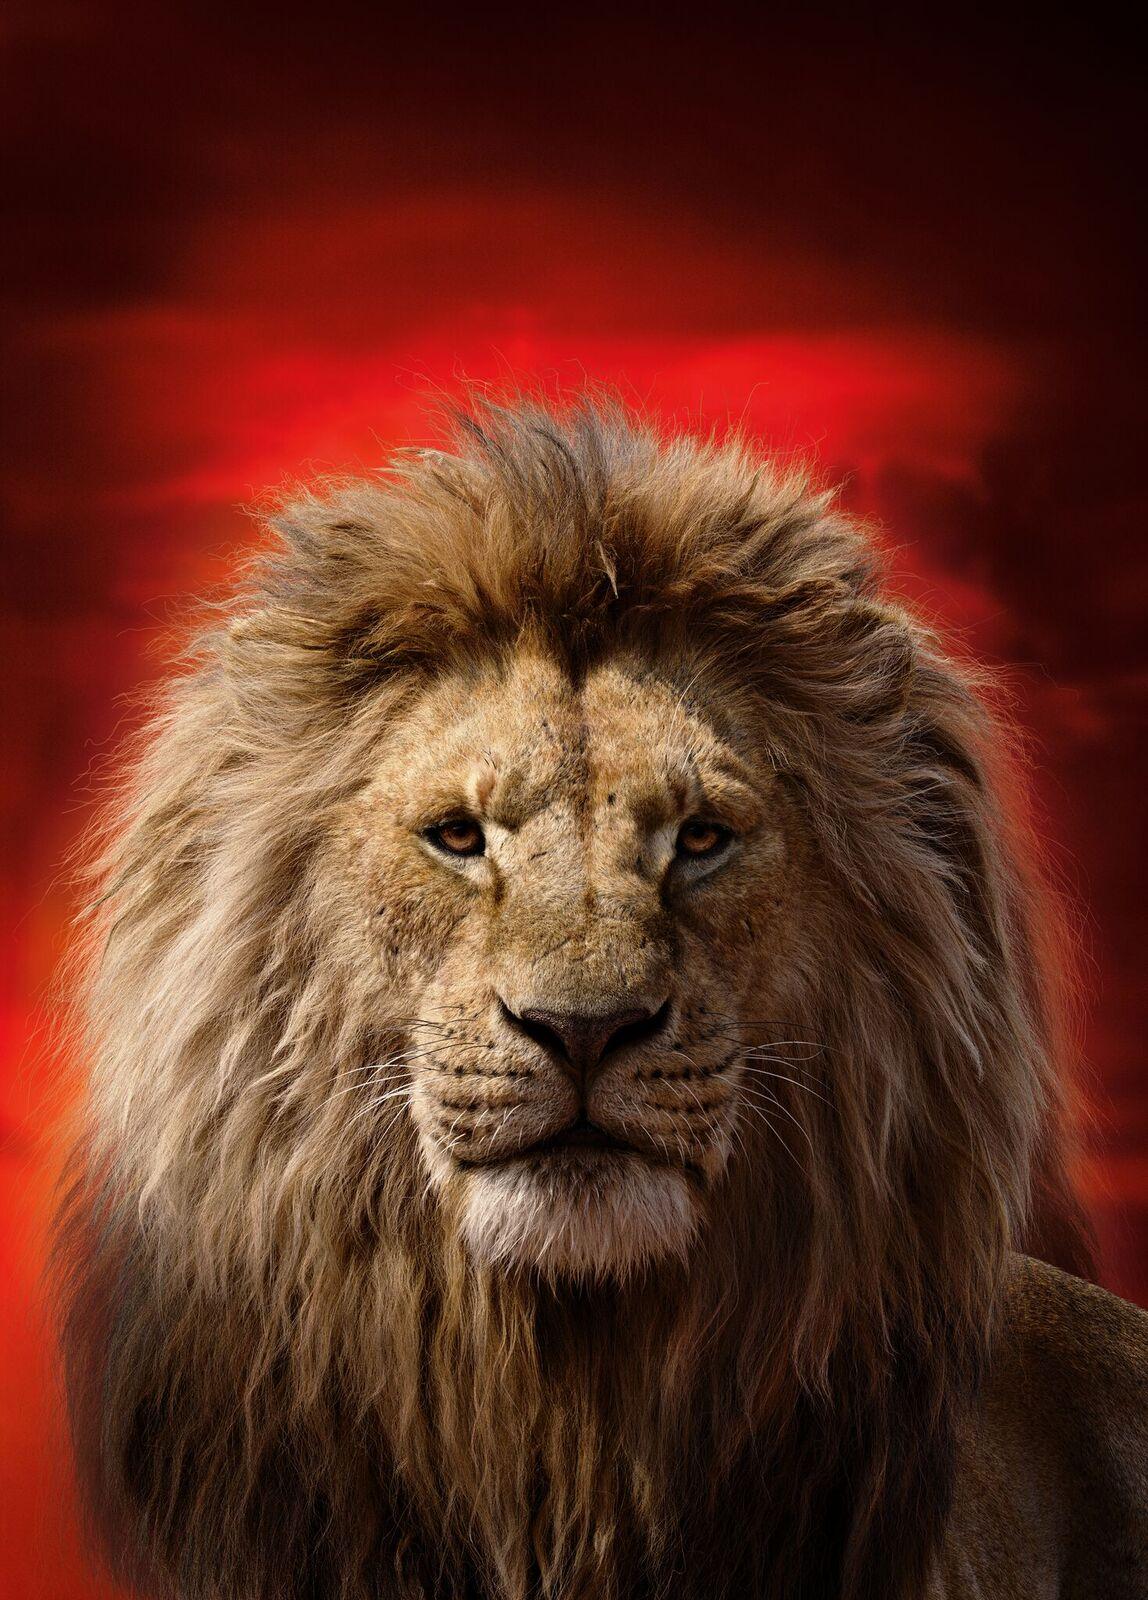 The Lion King 2019 Mufasa Textless By Mintmovi3 On Deviantart